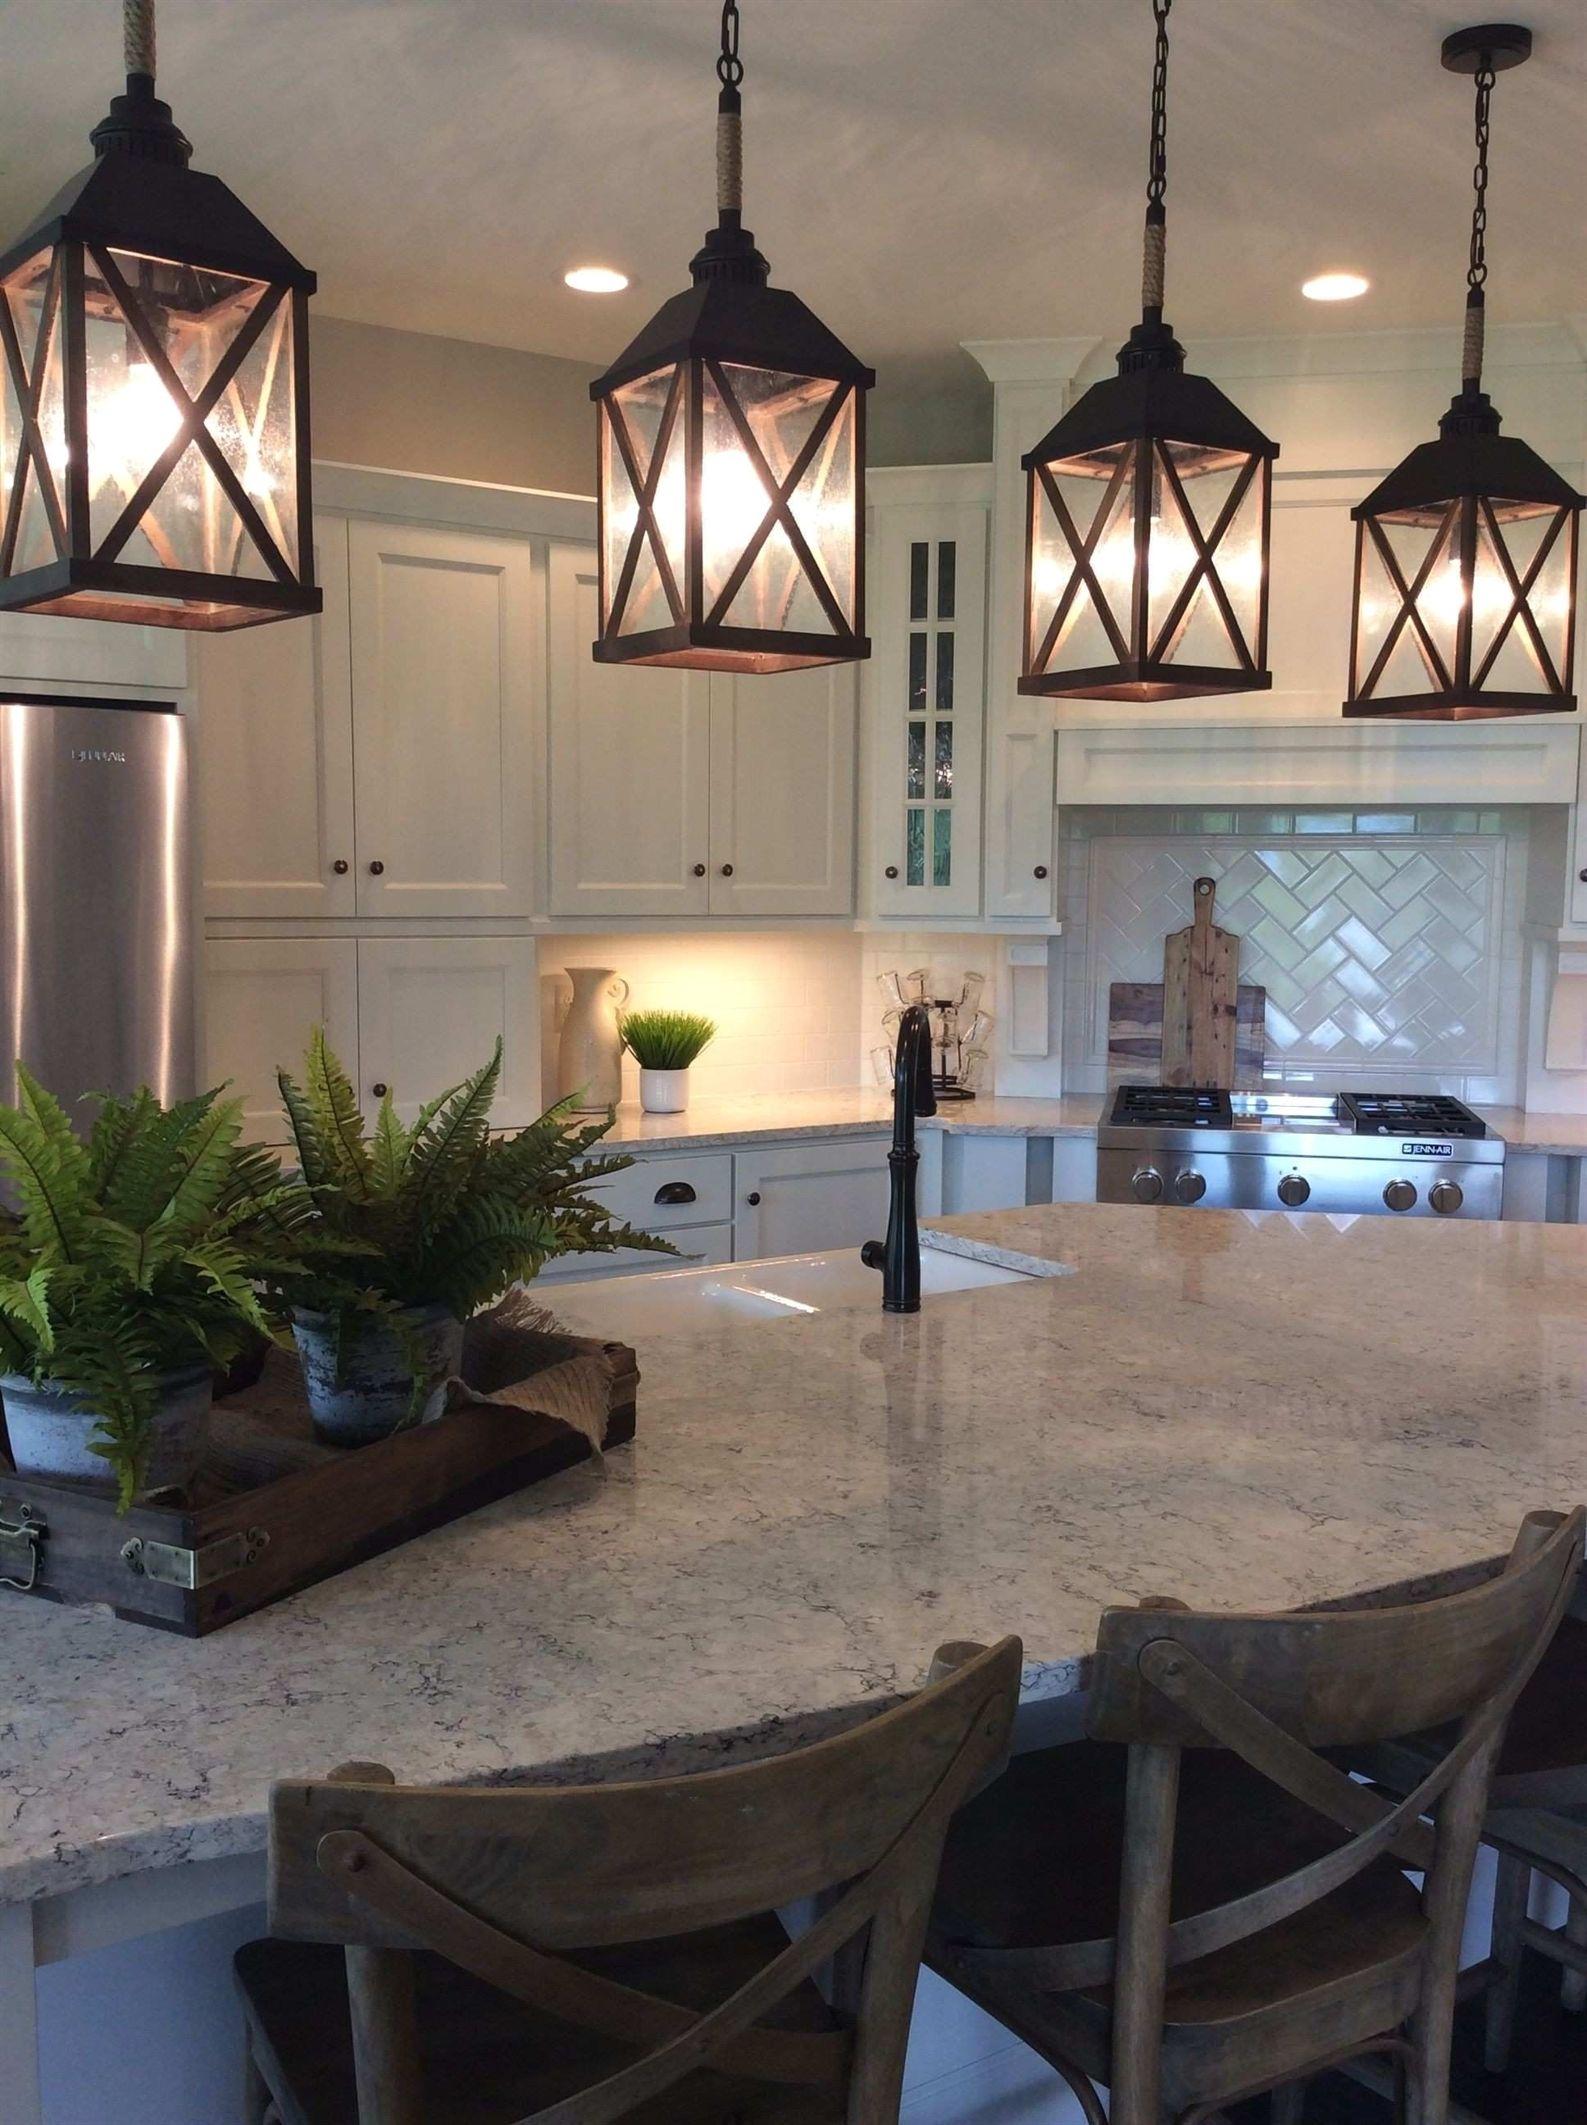 Relaterad Bild Modernkitchen Home Decor Kitchen Kitchen Island Lighting Kitchen Lighting Fixtures